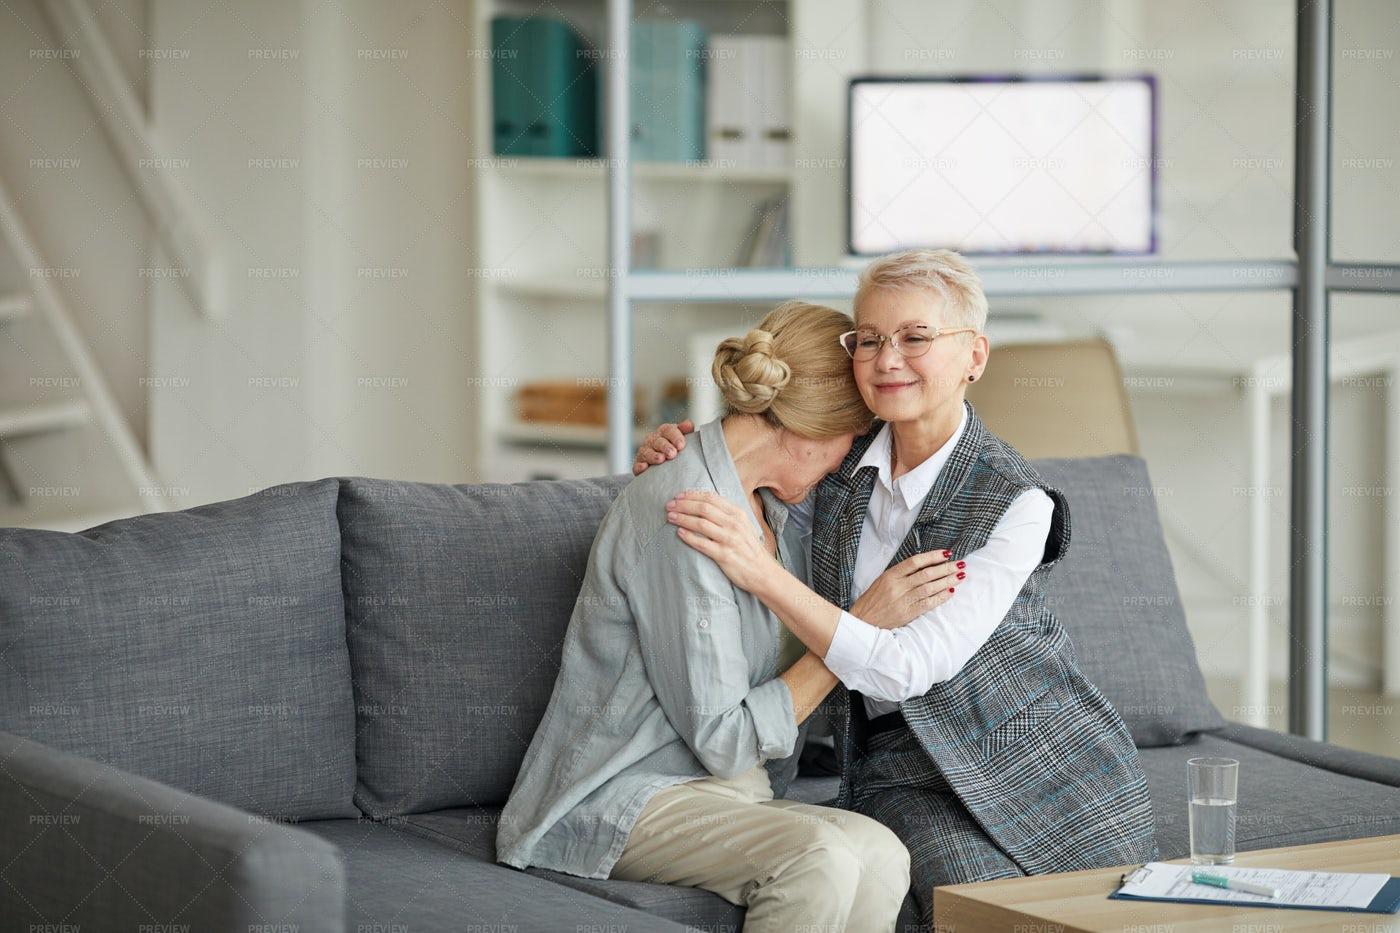 Female Psychologist Comforting...: Stock Photos